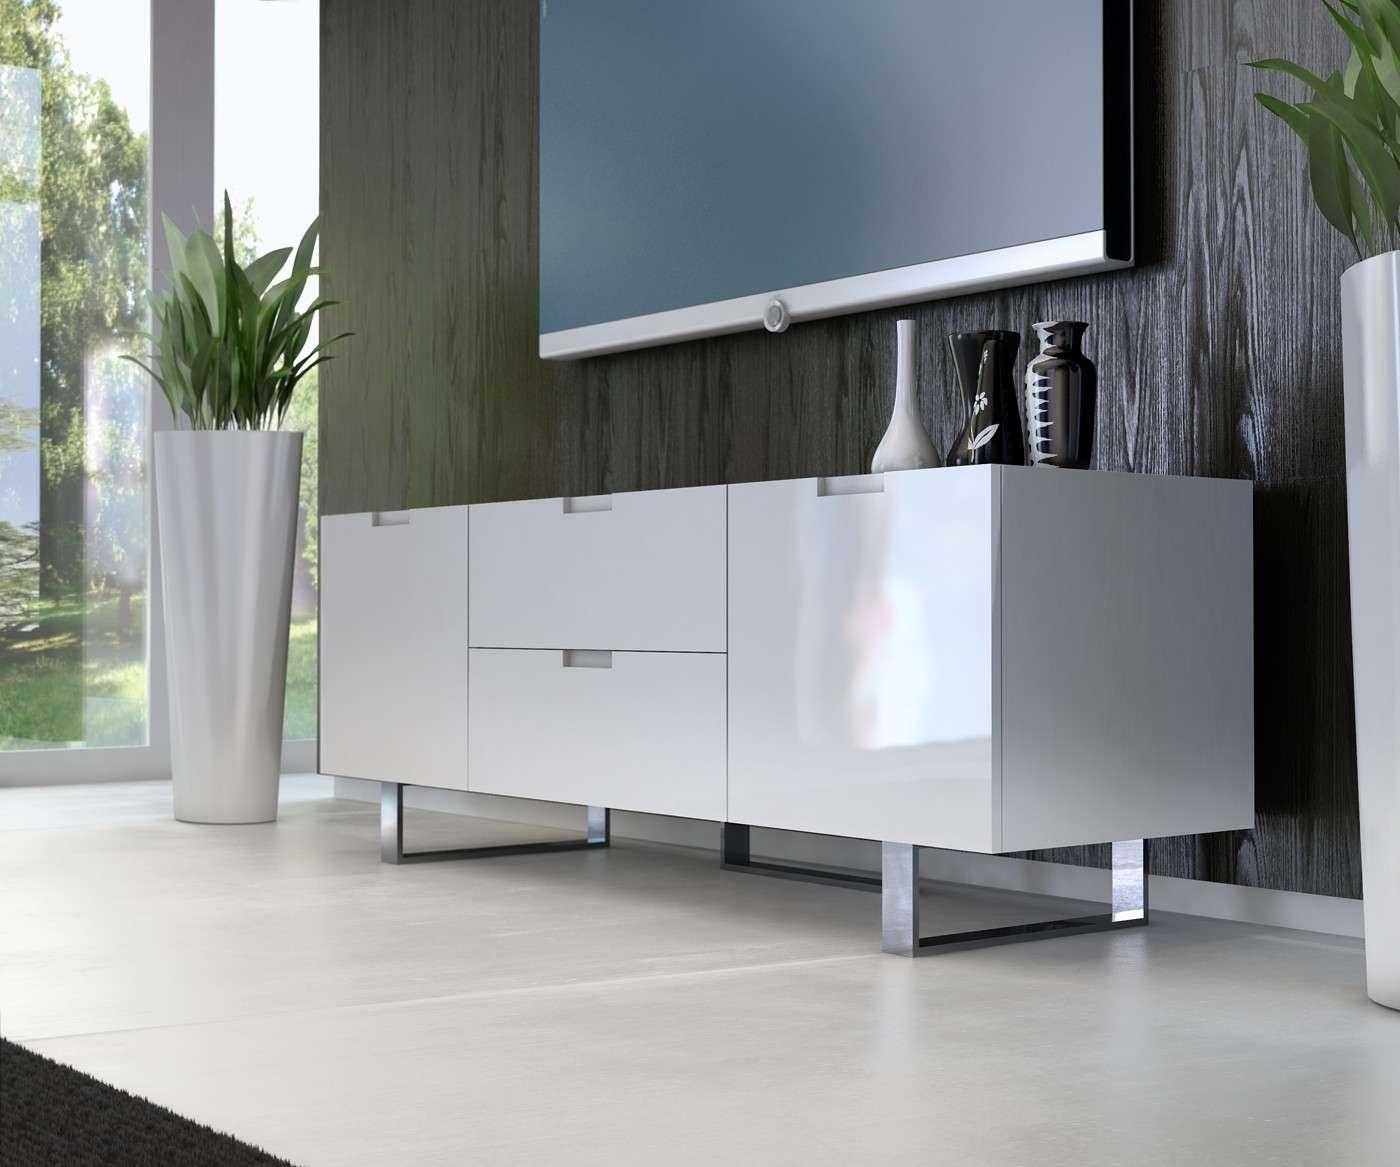 Eldridge Tv Standmodloft Buy From Nova Interiors Contemporary Pertaining To Modern White Lacquer Tv Stands (View 7 of 15)